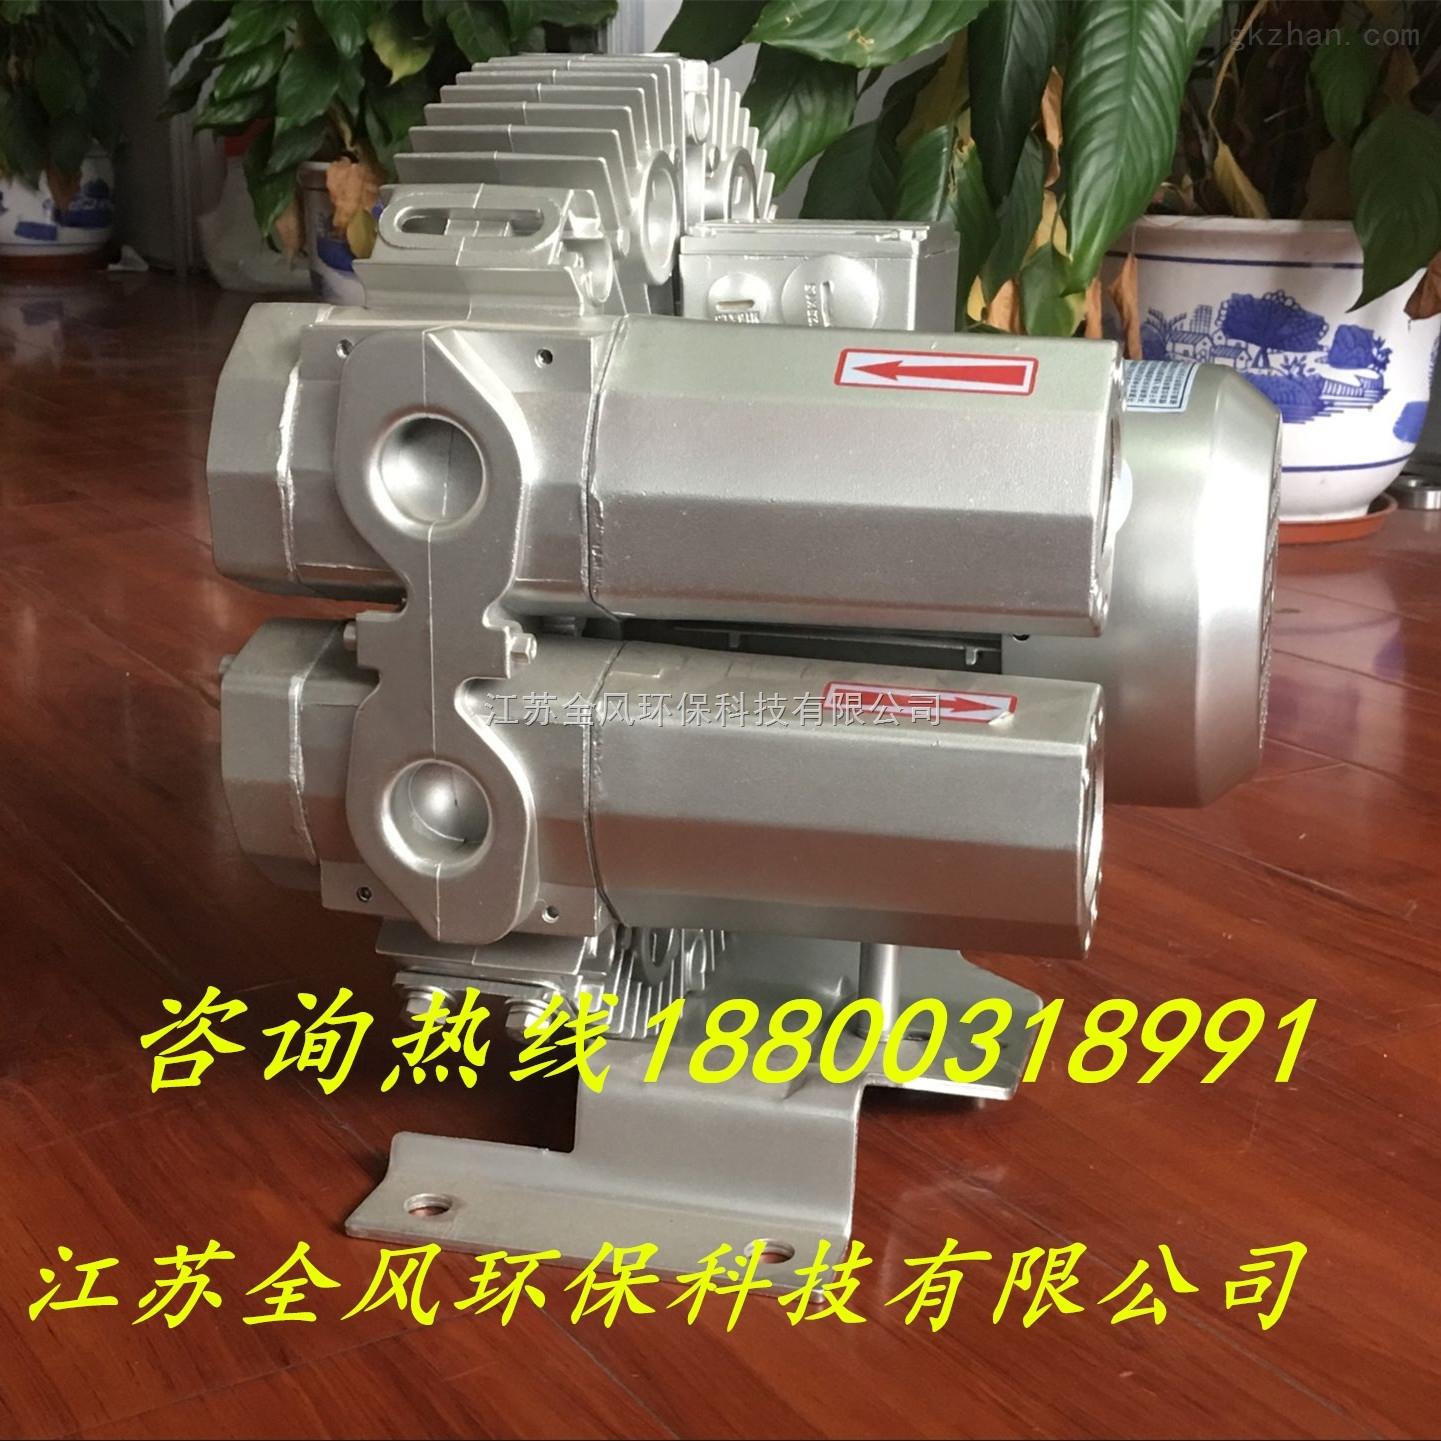 YX-21DH 0.55KW气环式压缩真空泵